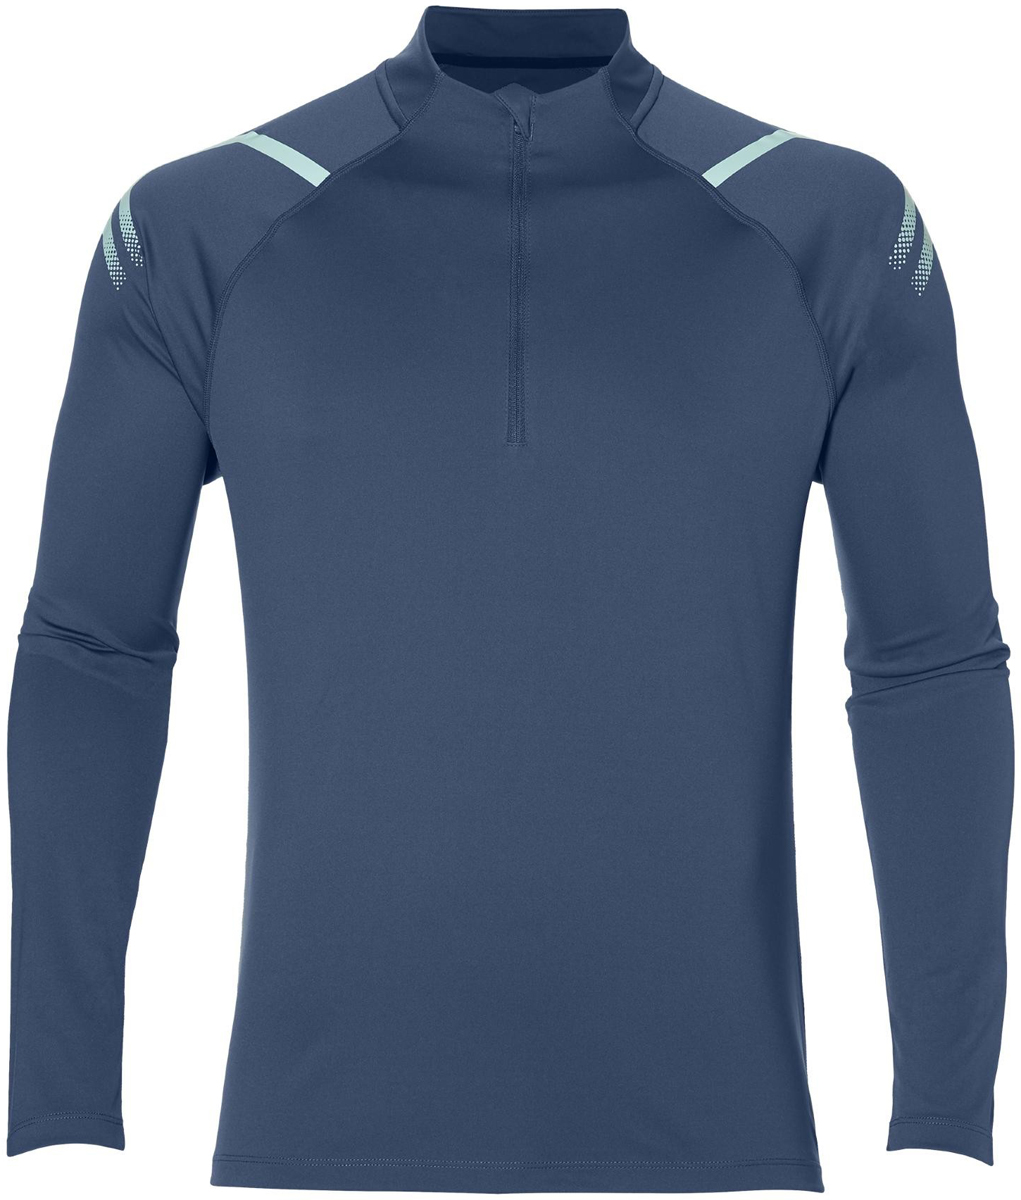 Лонгслив мужской Asics Icon Ls 1/2 Zip, цвет: синий. 154588-0793. Размер XXL (54) лонгслив мужской asics ls 1 2 zip jersey цвет темно синий 154589 1273 размер xl 50